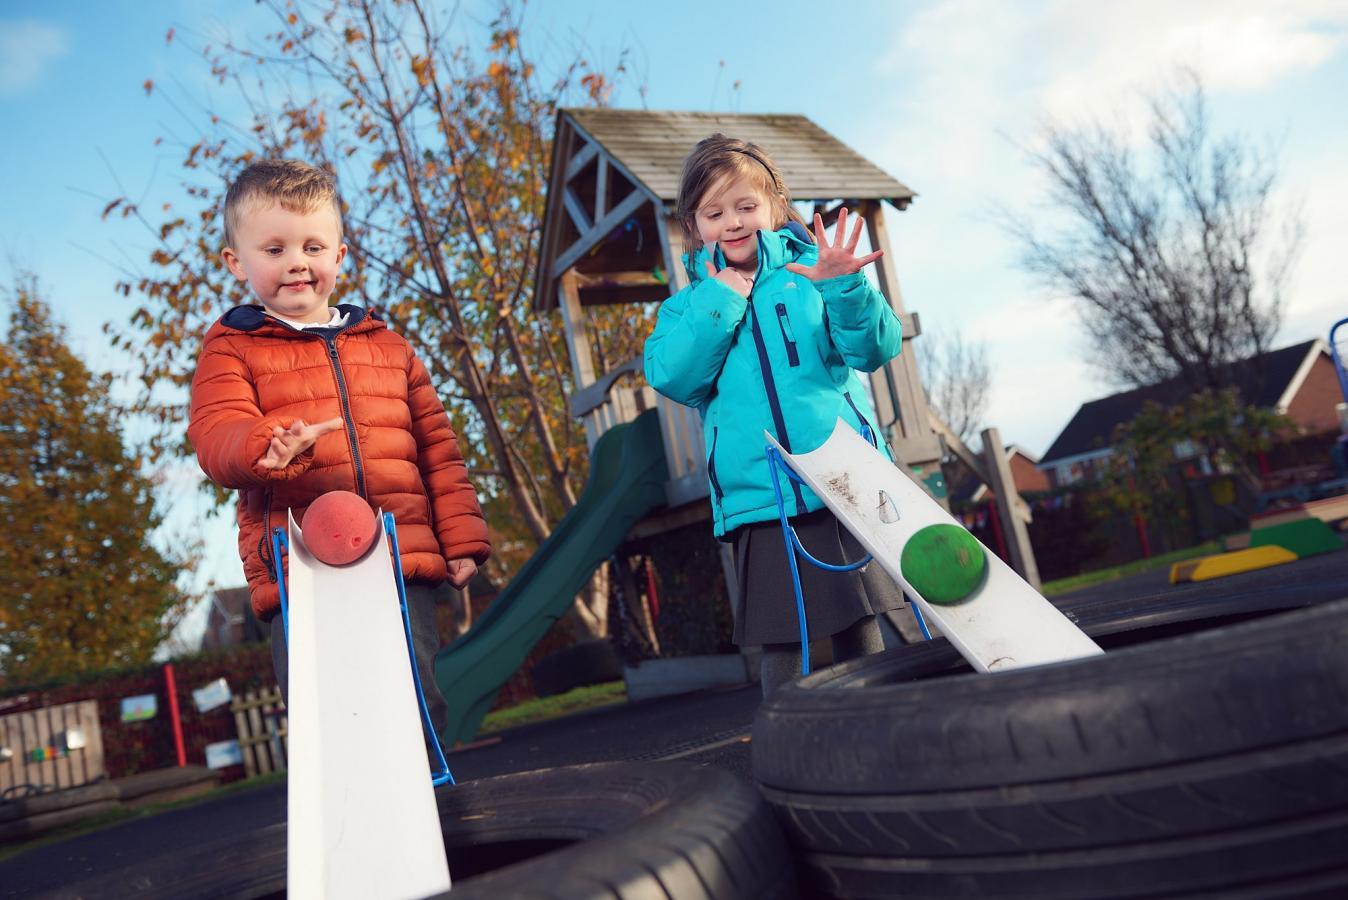 Towngate pupils playing